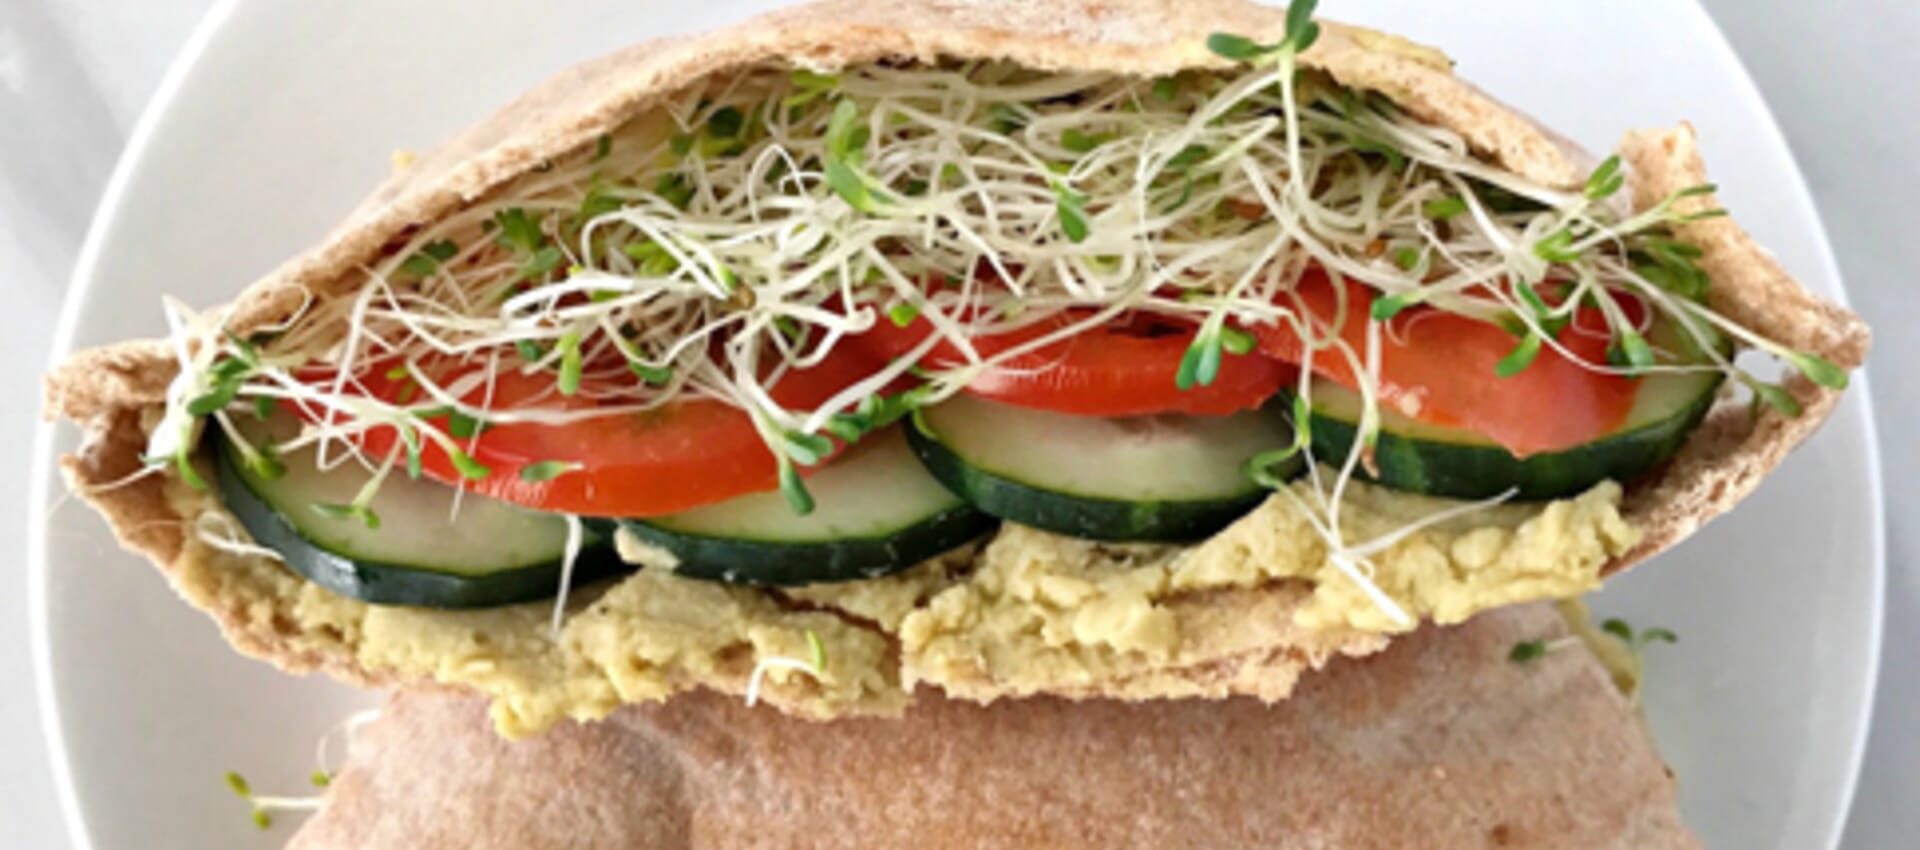 Veggie Pita Sandwiches with Avocado Hummus